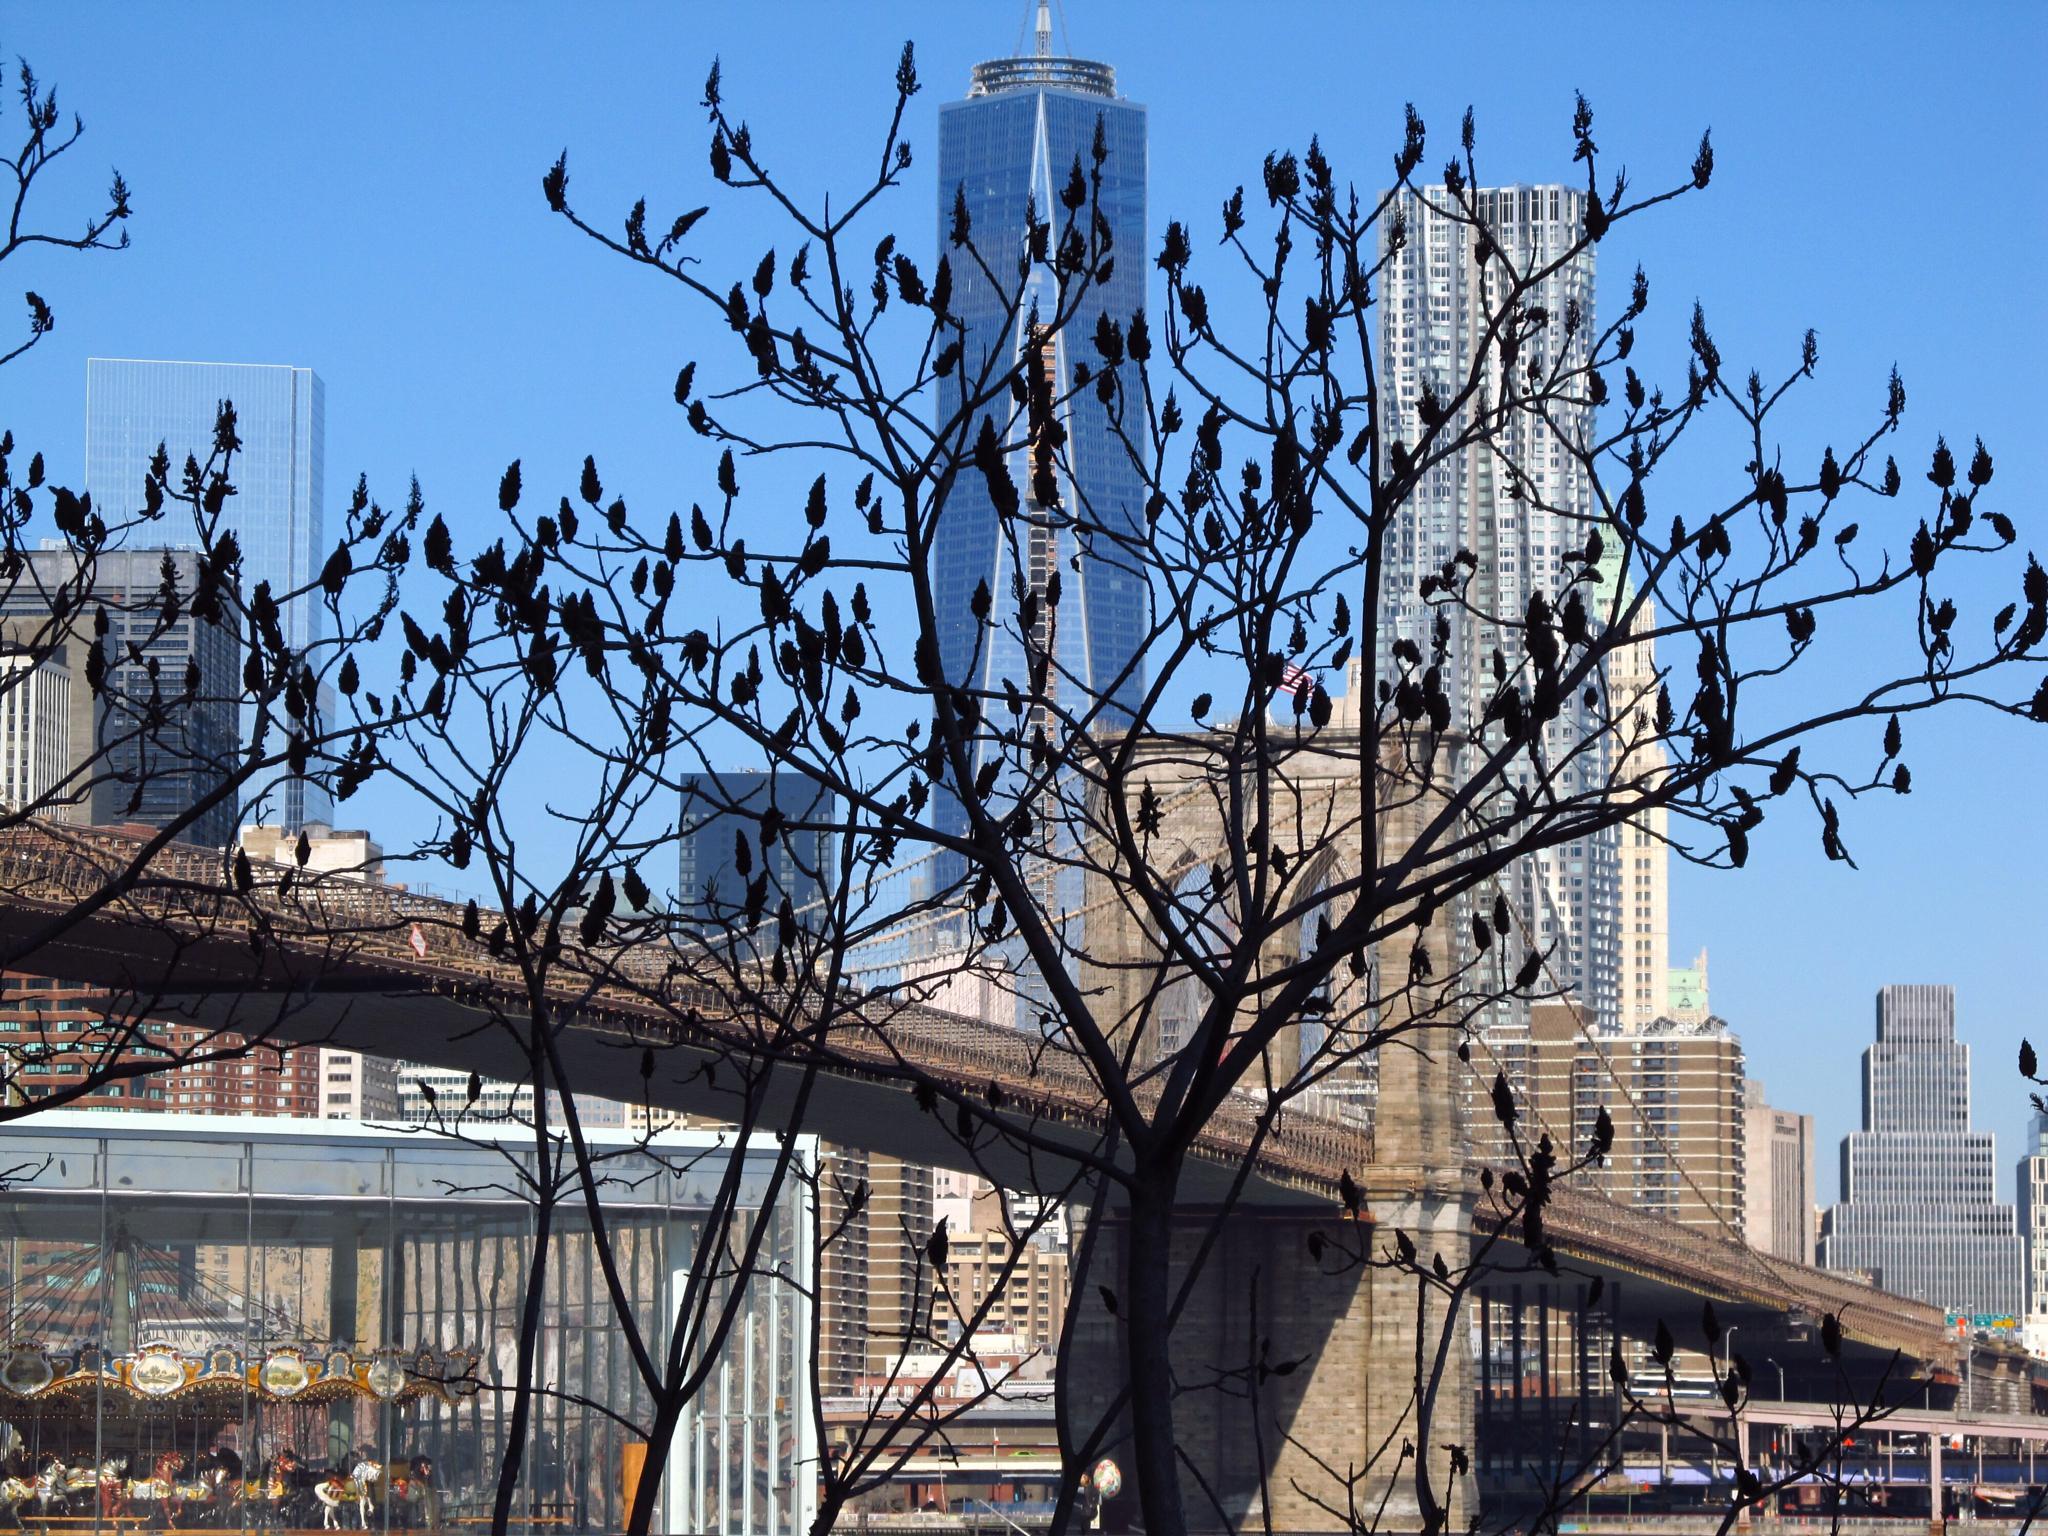 NYC Brooklin Bridge by Harry Schäfer